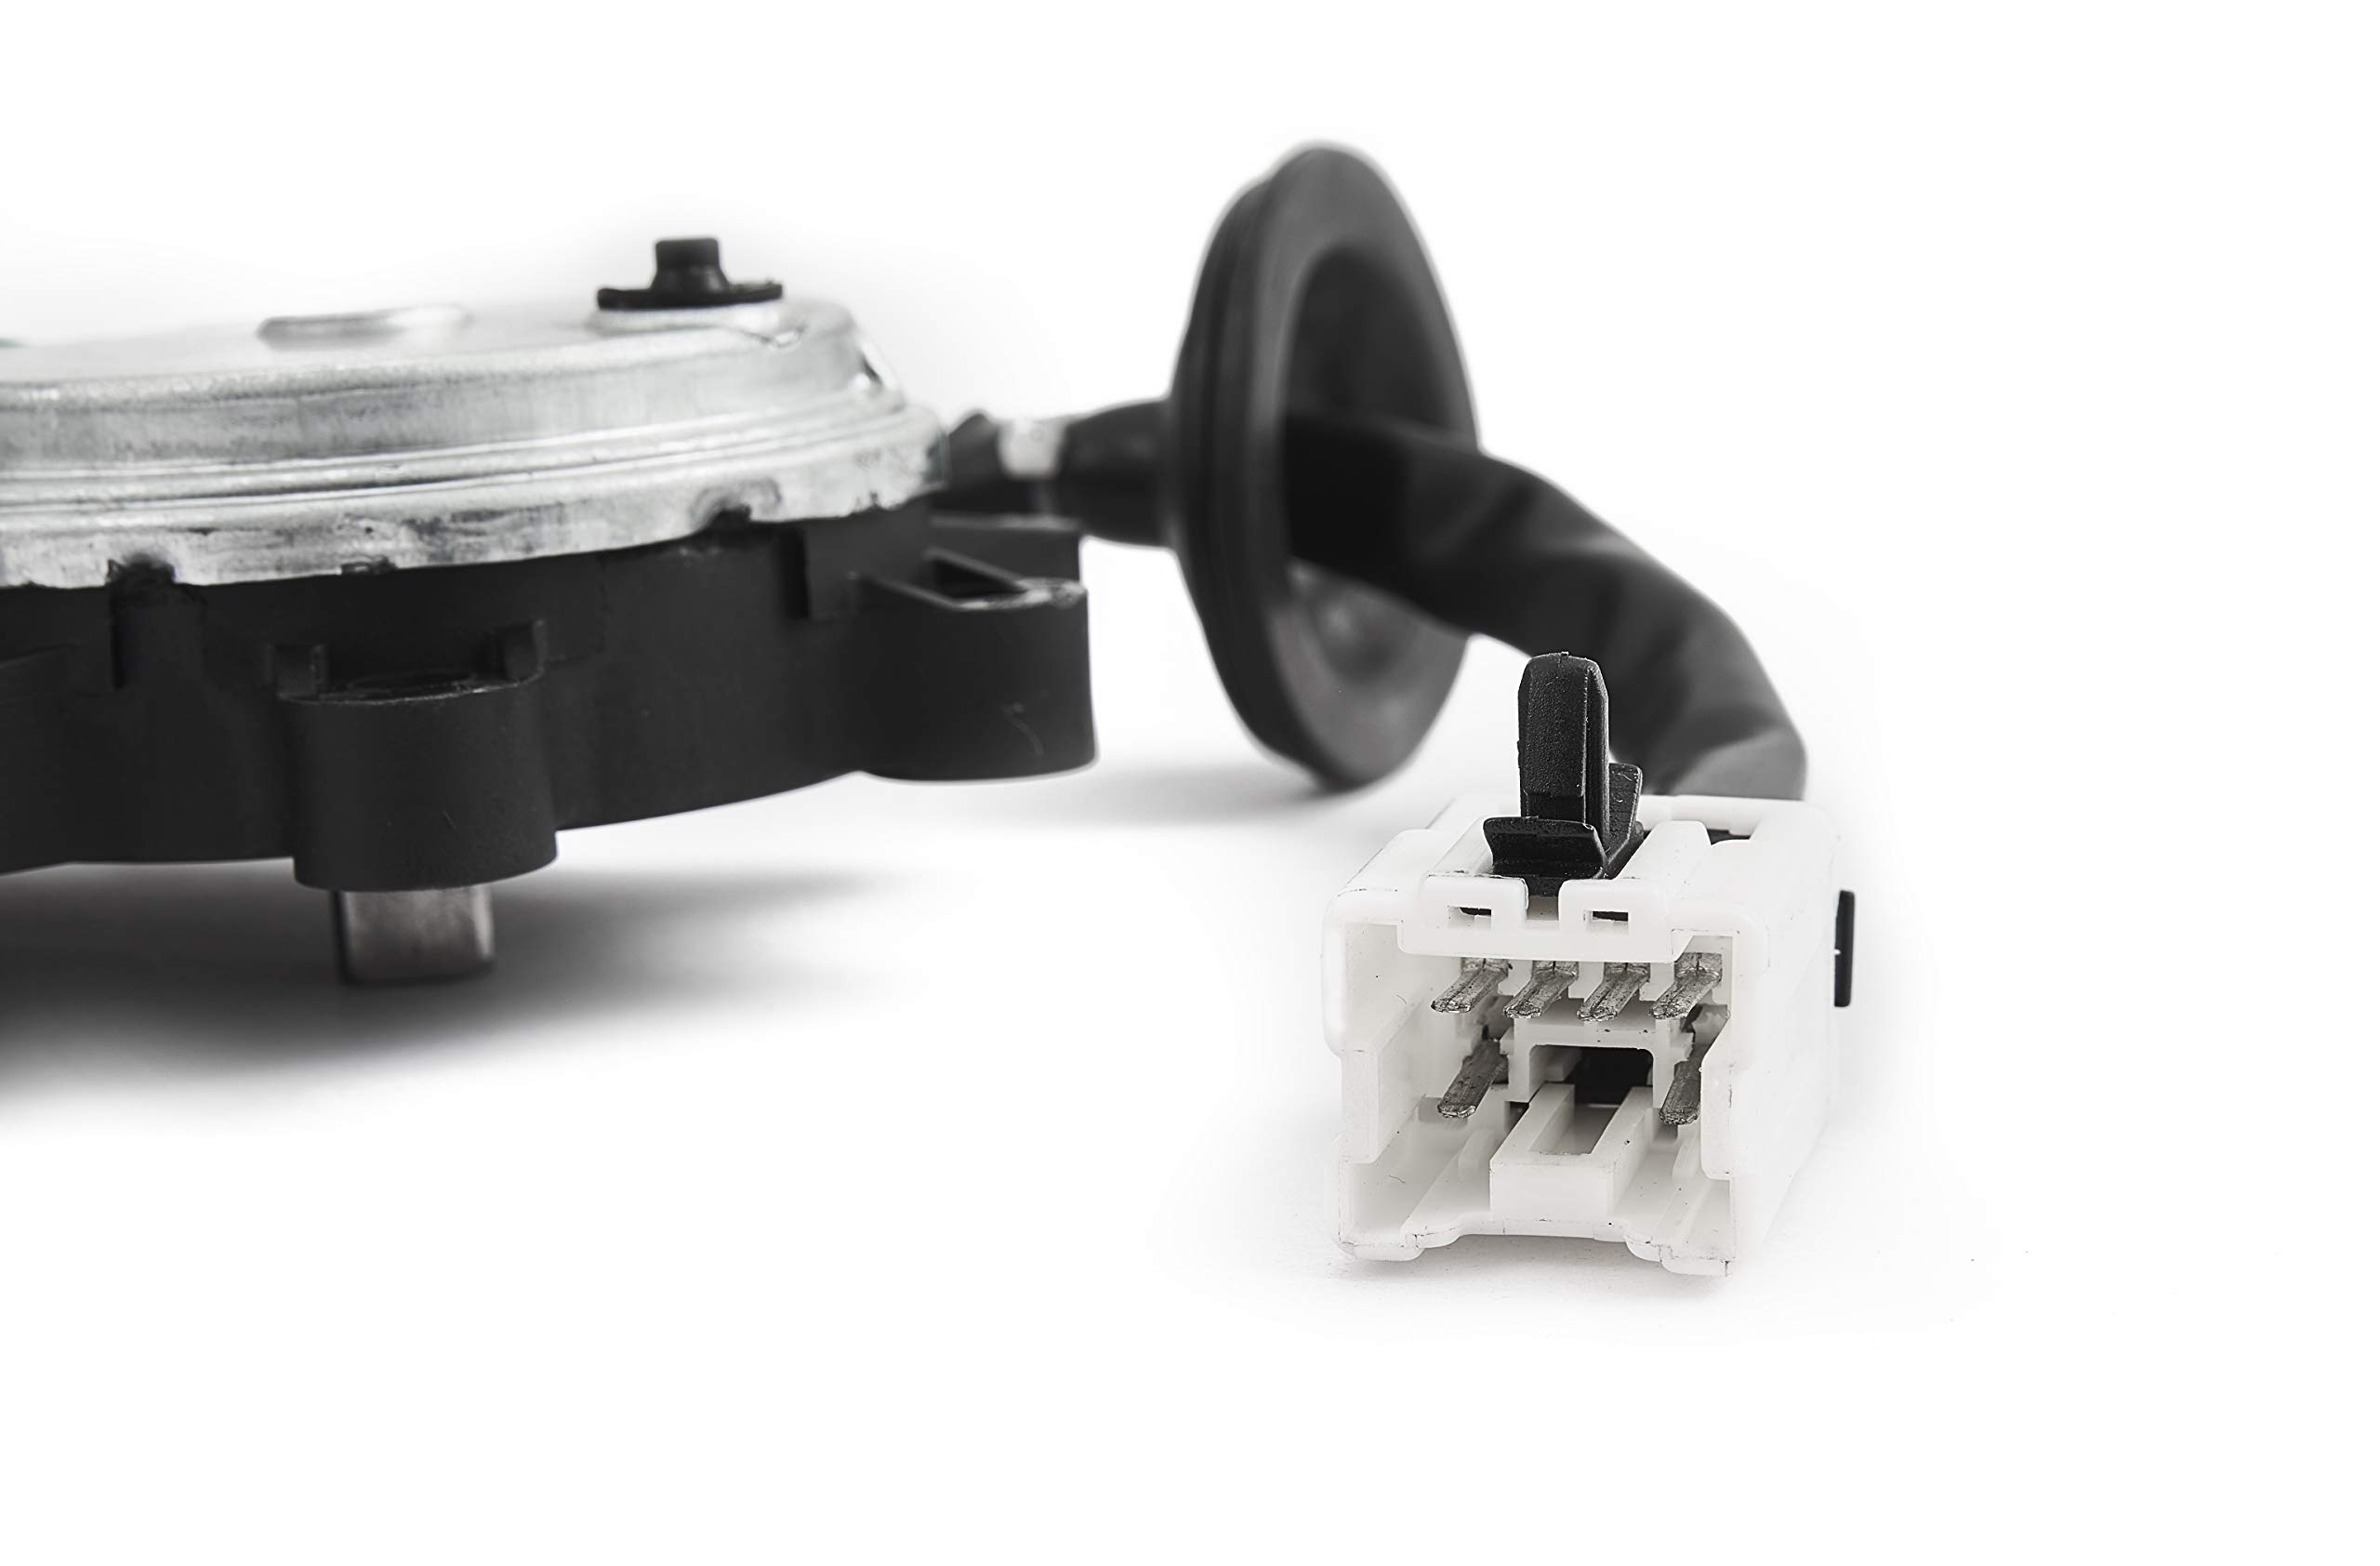 JESBEN Throttle Position Sensor TPS Fit For 350Z 3.5L 2003-2007 Infiniti G35 Sedan 3.5L 2003-2006 18919-AM810